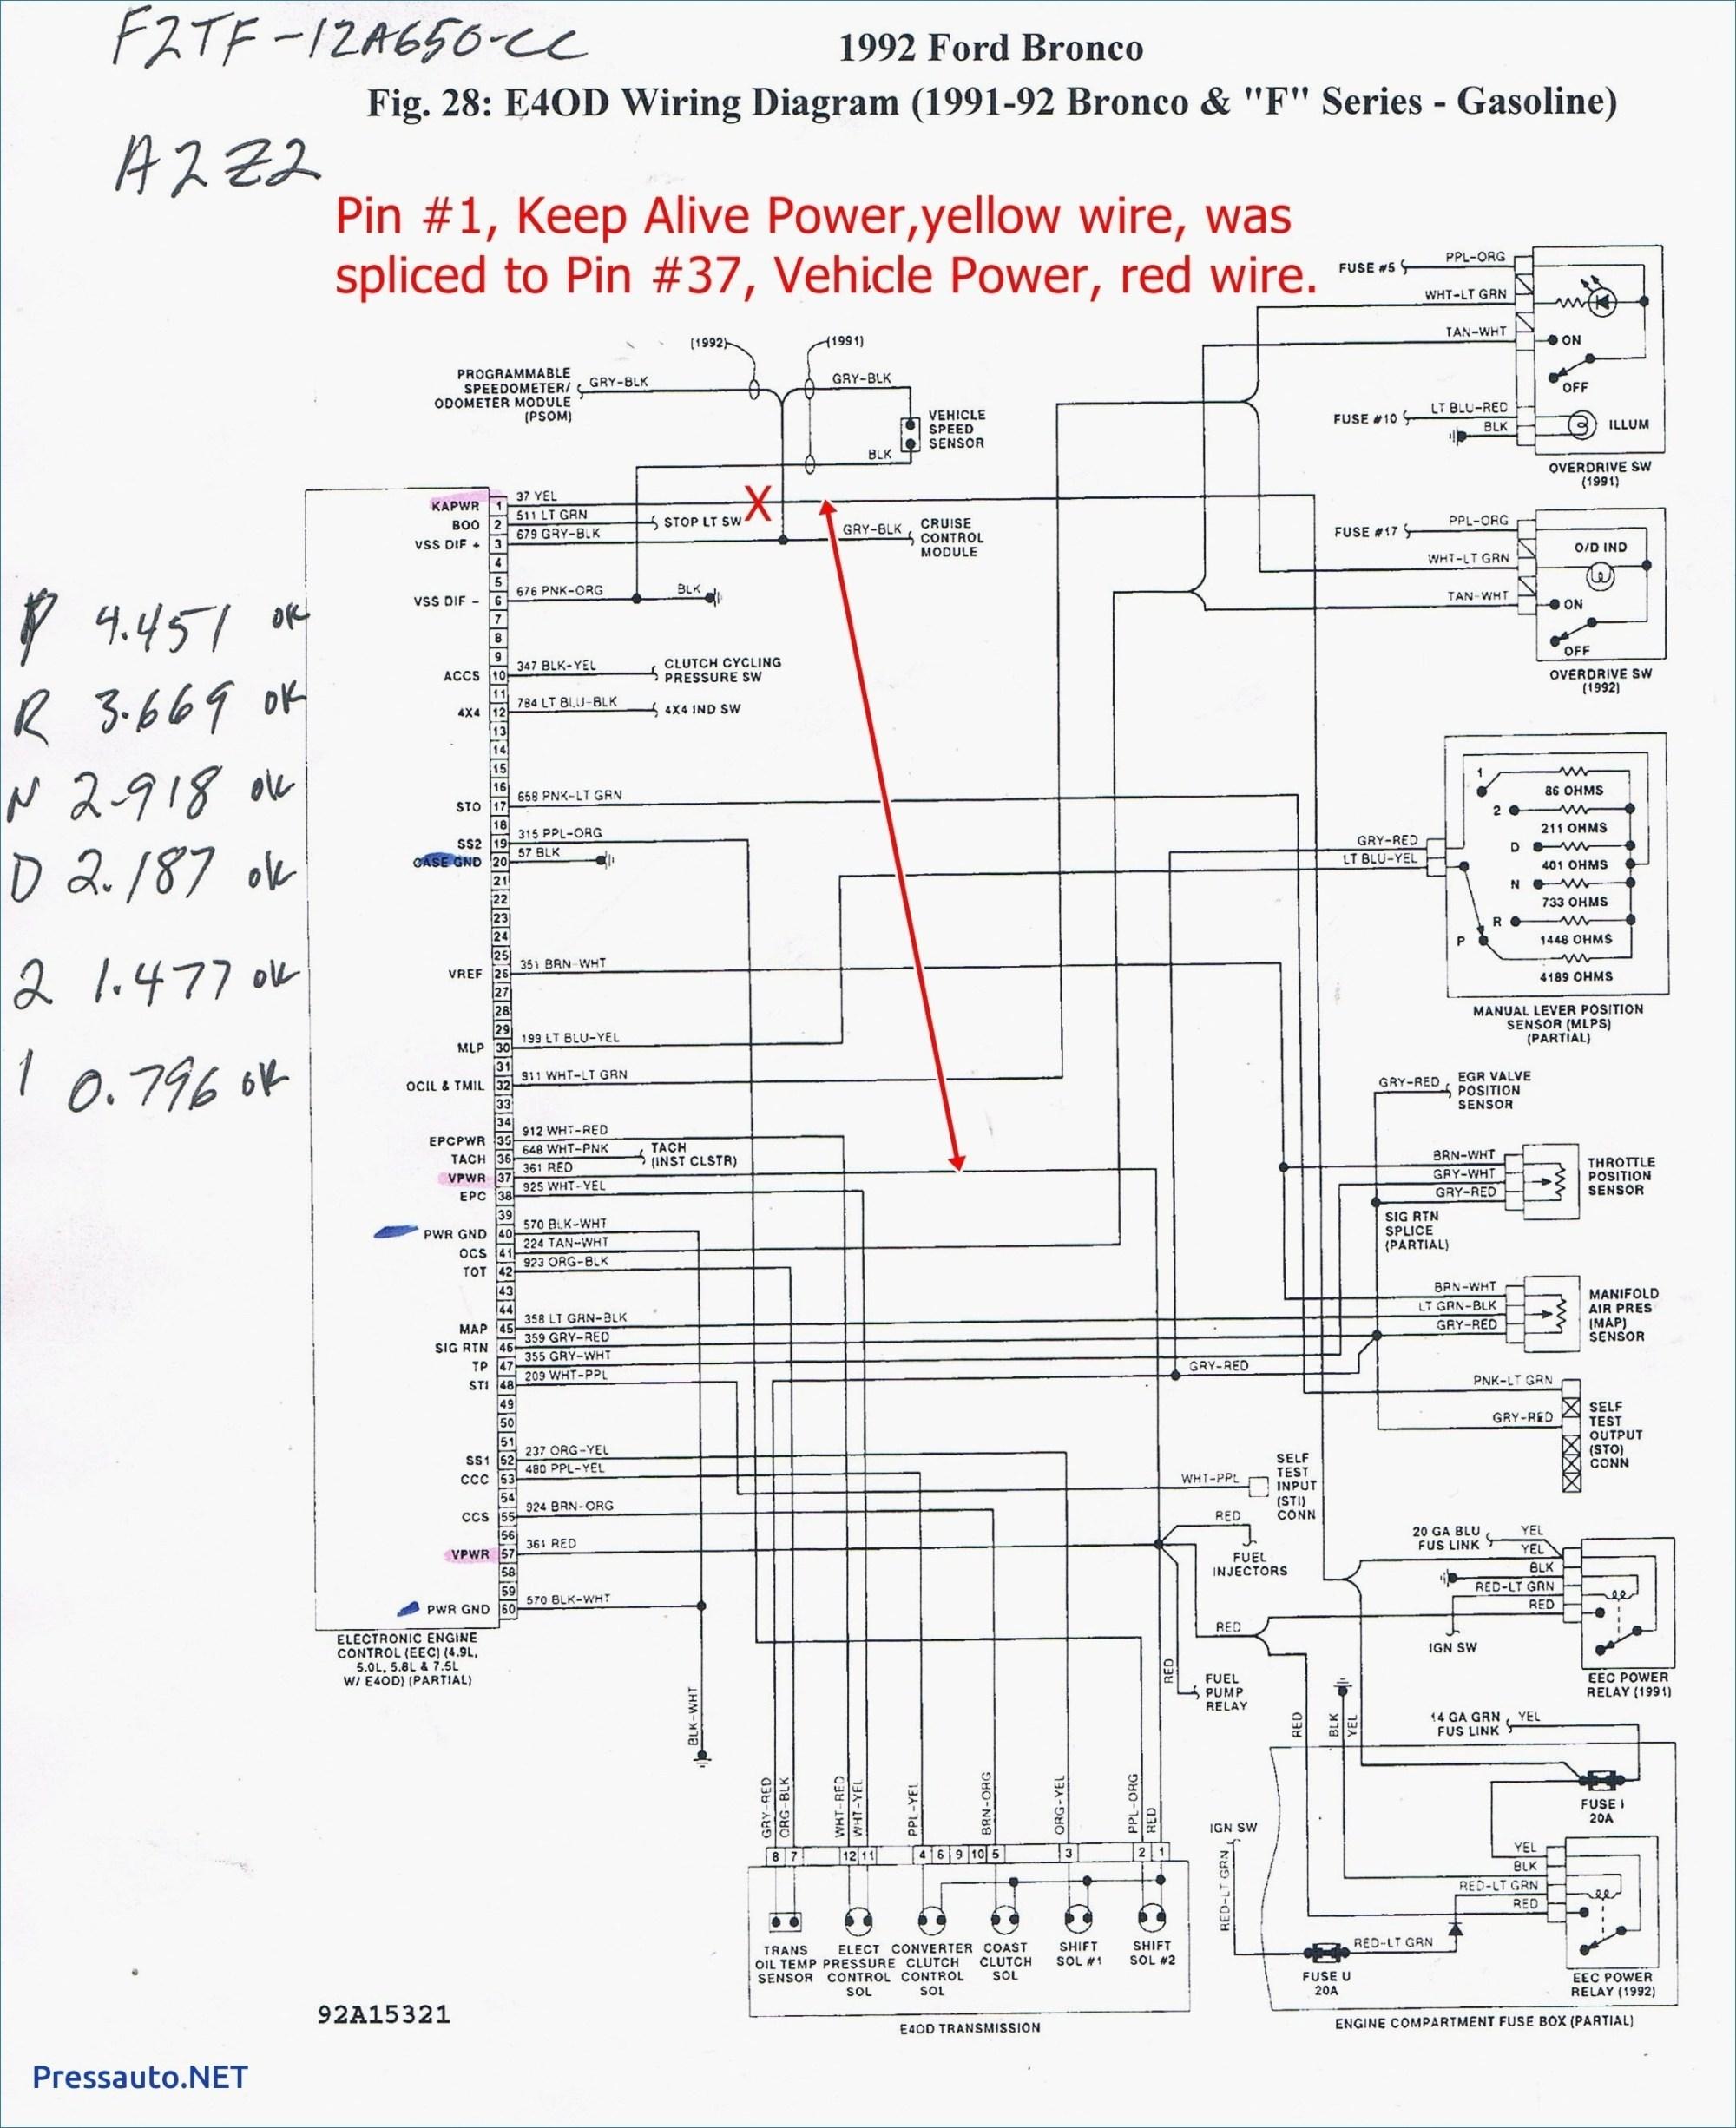 hight resolution of 2002 dodge ram 1500 stereo wiring diagram free wiring diagram rh ricardolevinsmorales com 2002 dodge 2500 radio wiring diagram 2002 dodge 2500 radio wiring